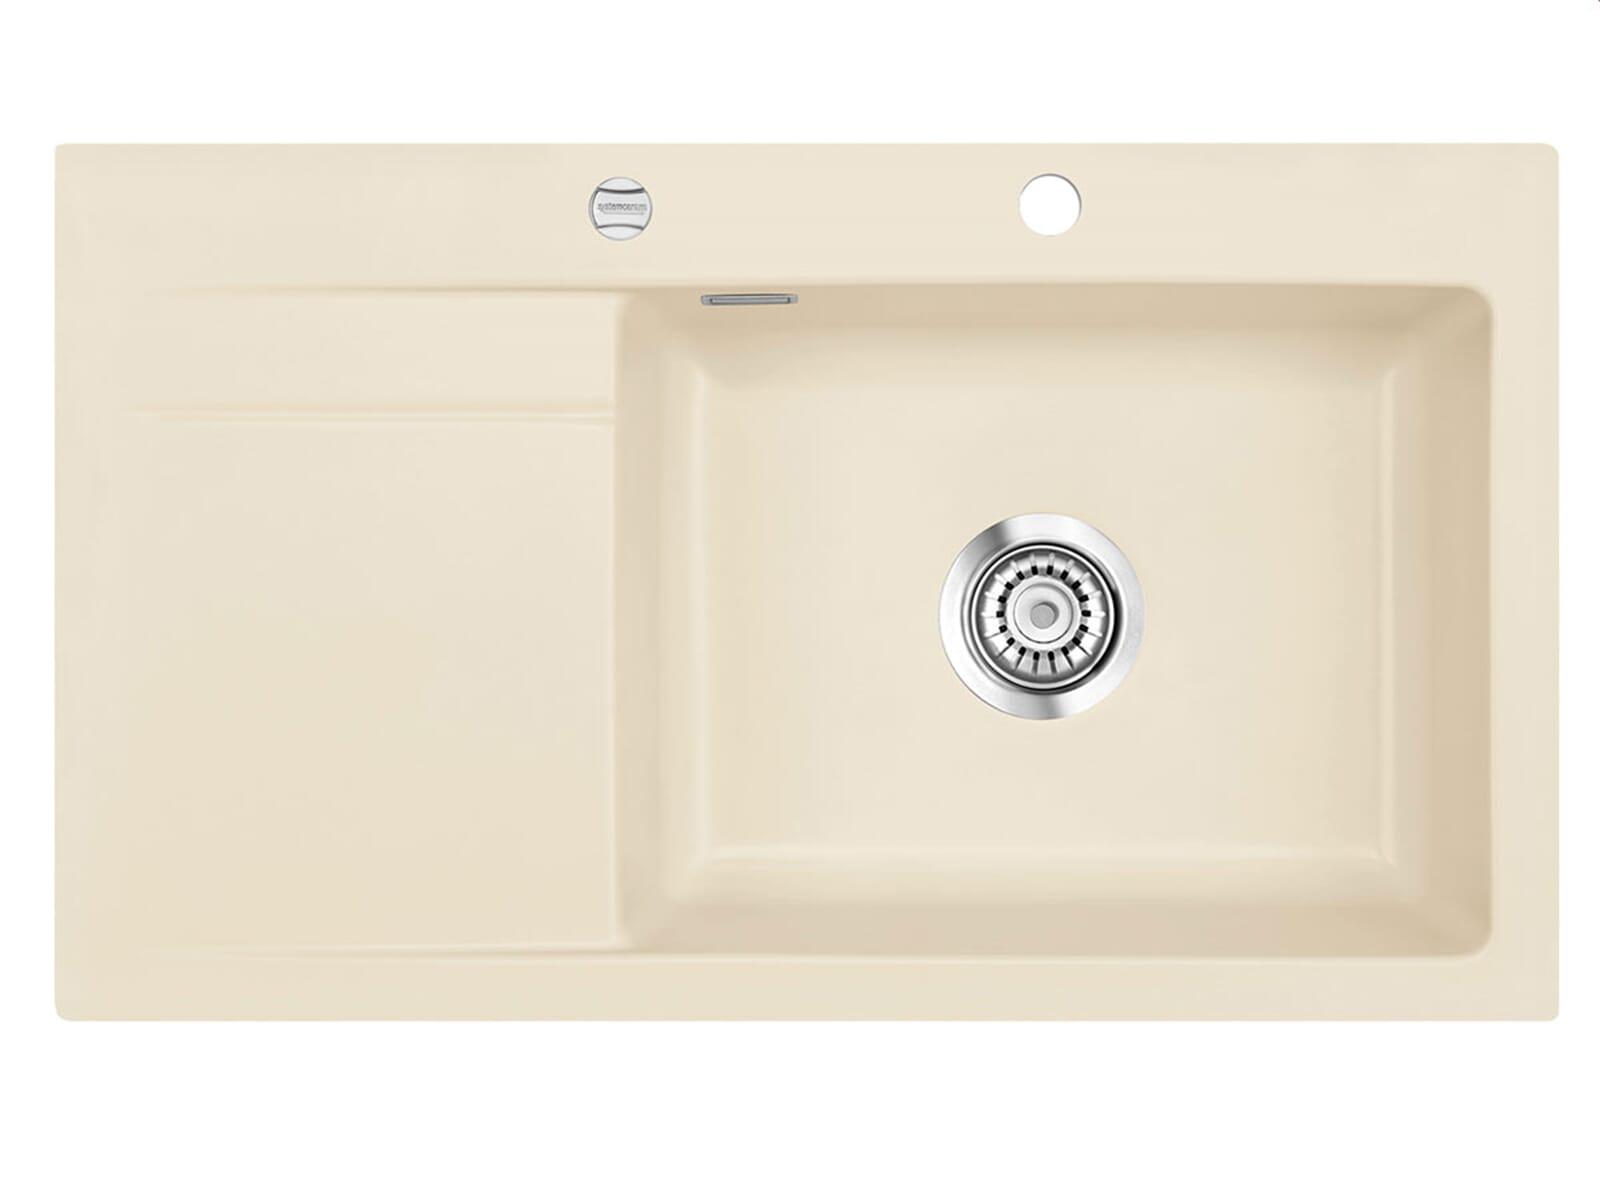 Systemceram Stema 86 SL Noblesse Keramikspüle Excenterbetätigung